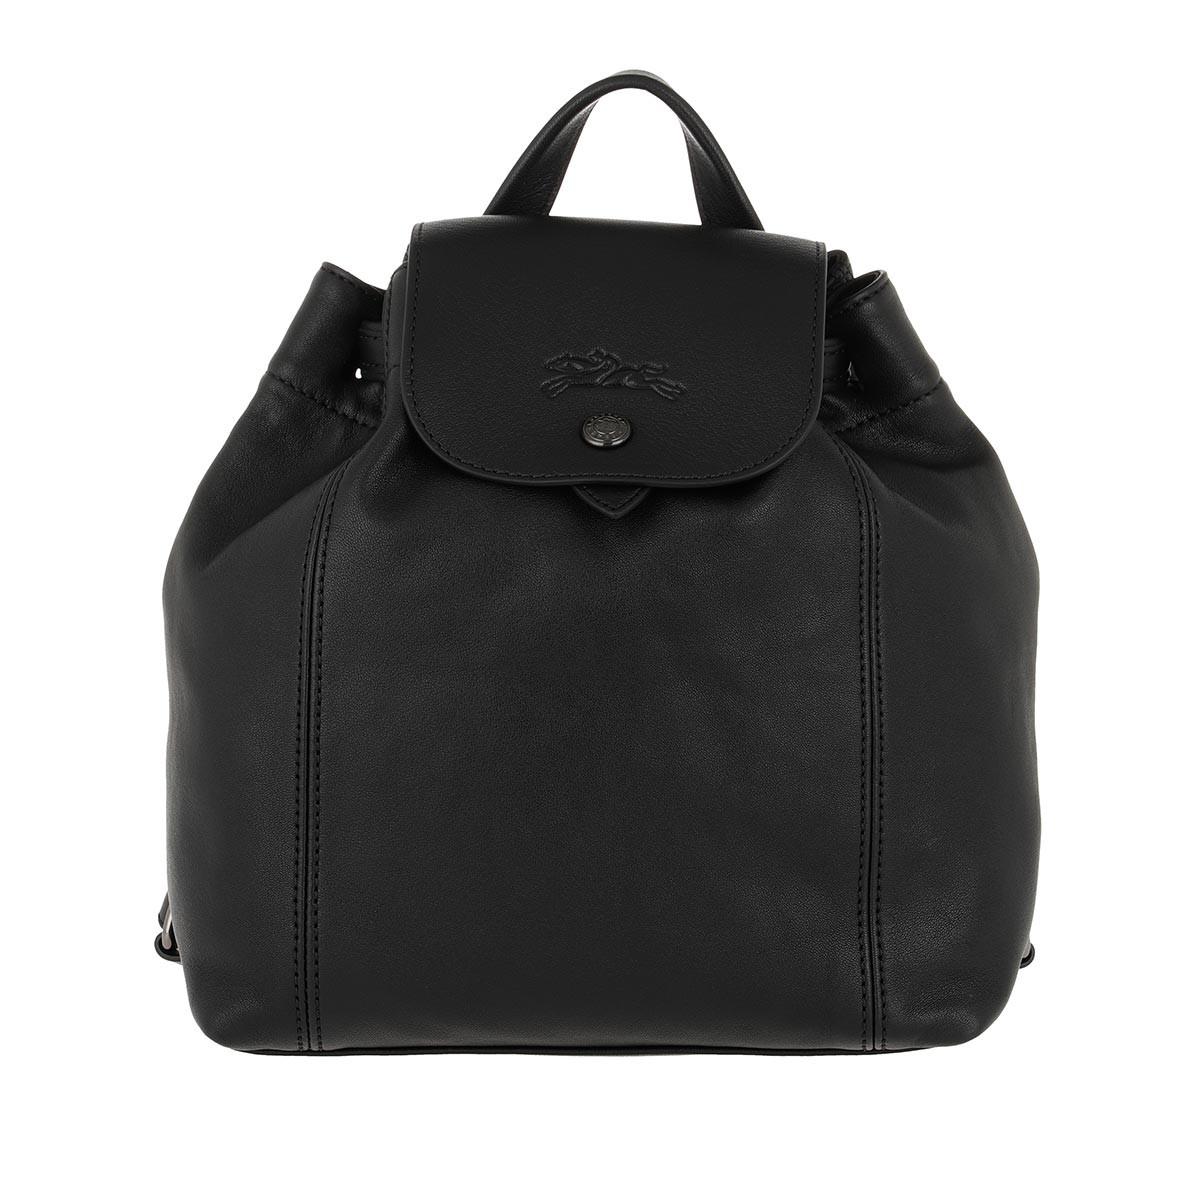 Longchamp Rucksack - Le Pliage Backpack XS Leather Black - in schwarz - für Damen